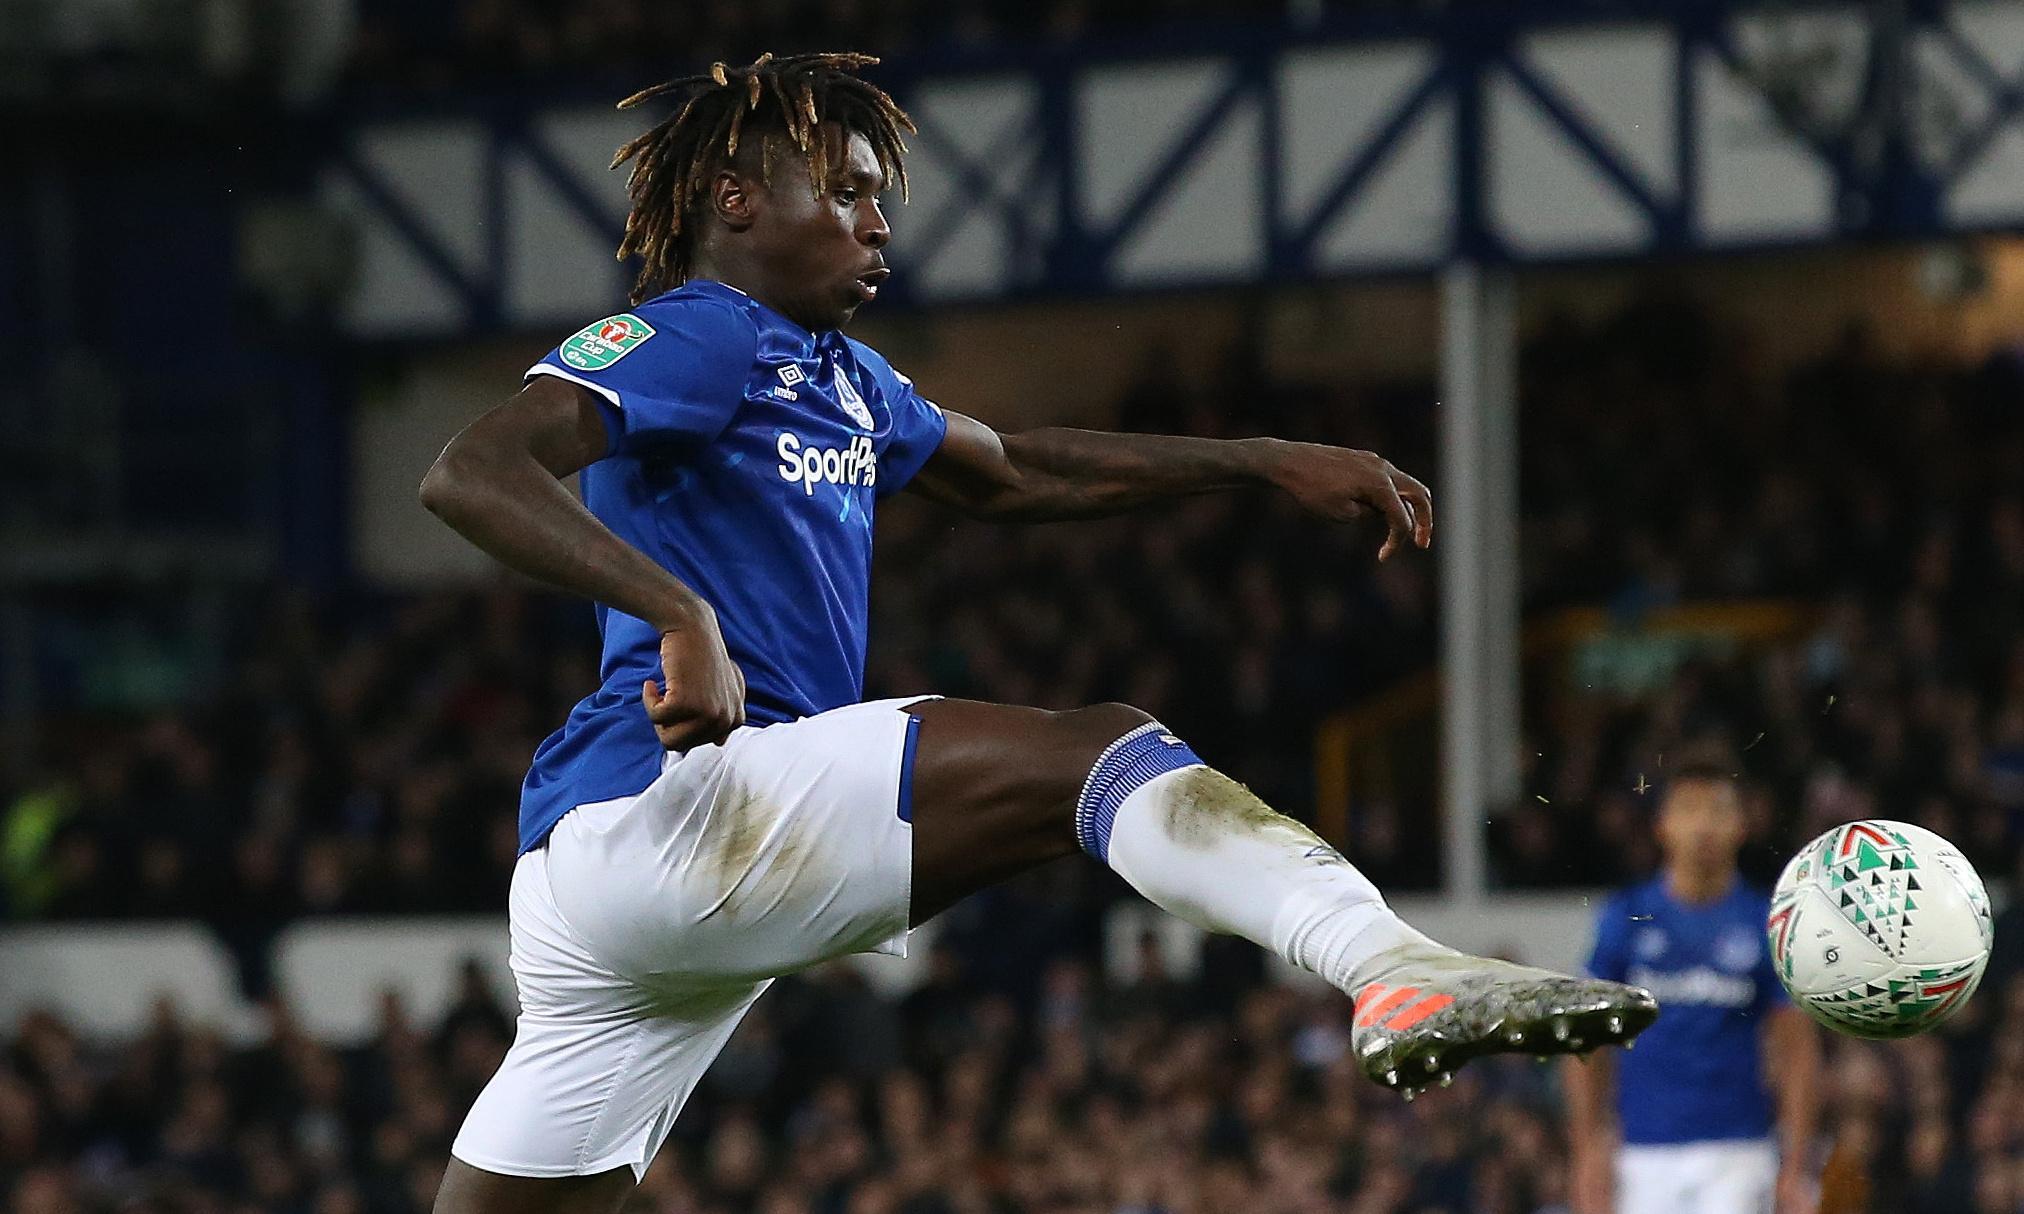 Moise Kean will 'definitely not' leave Everton in January, says Marco Silva